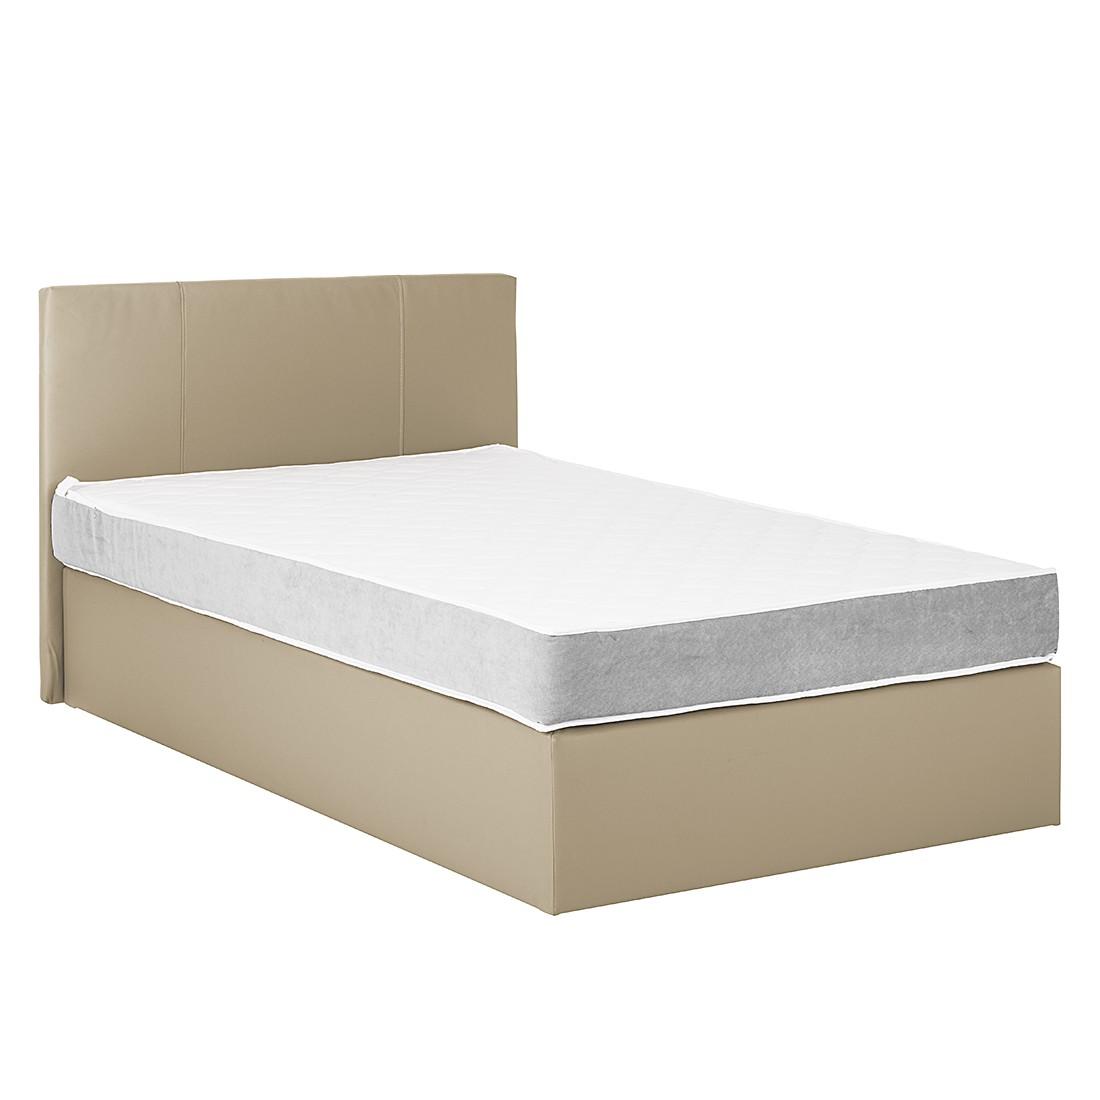 boxspringbett pluto kunstleder webstoff ohne topper 160 x 200cm wei dunkelgrau. Black Bedroom Furniture Sets. Home Design Ideas